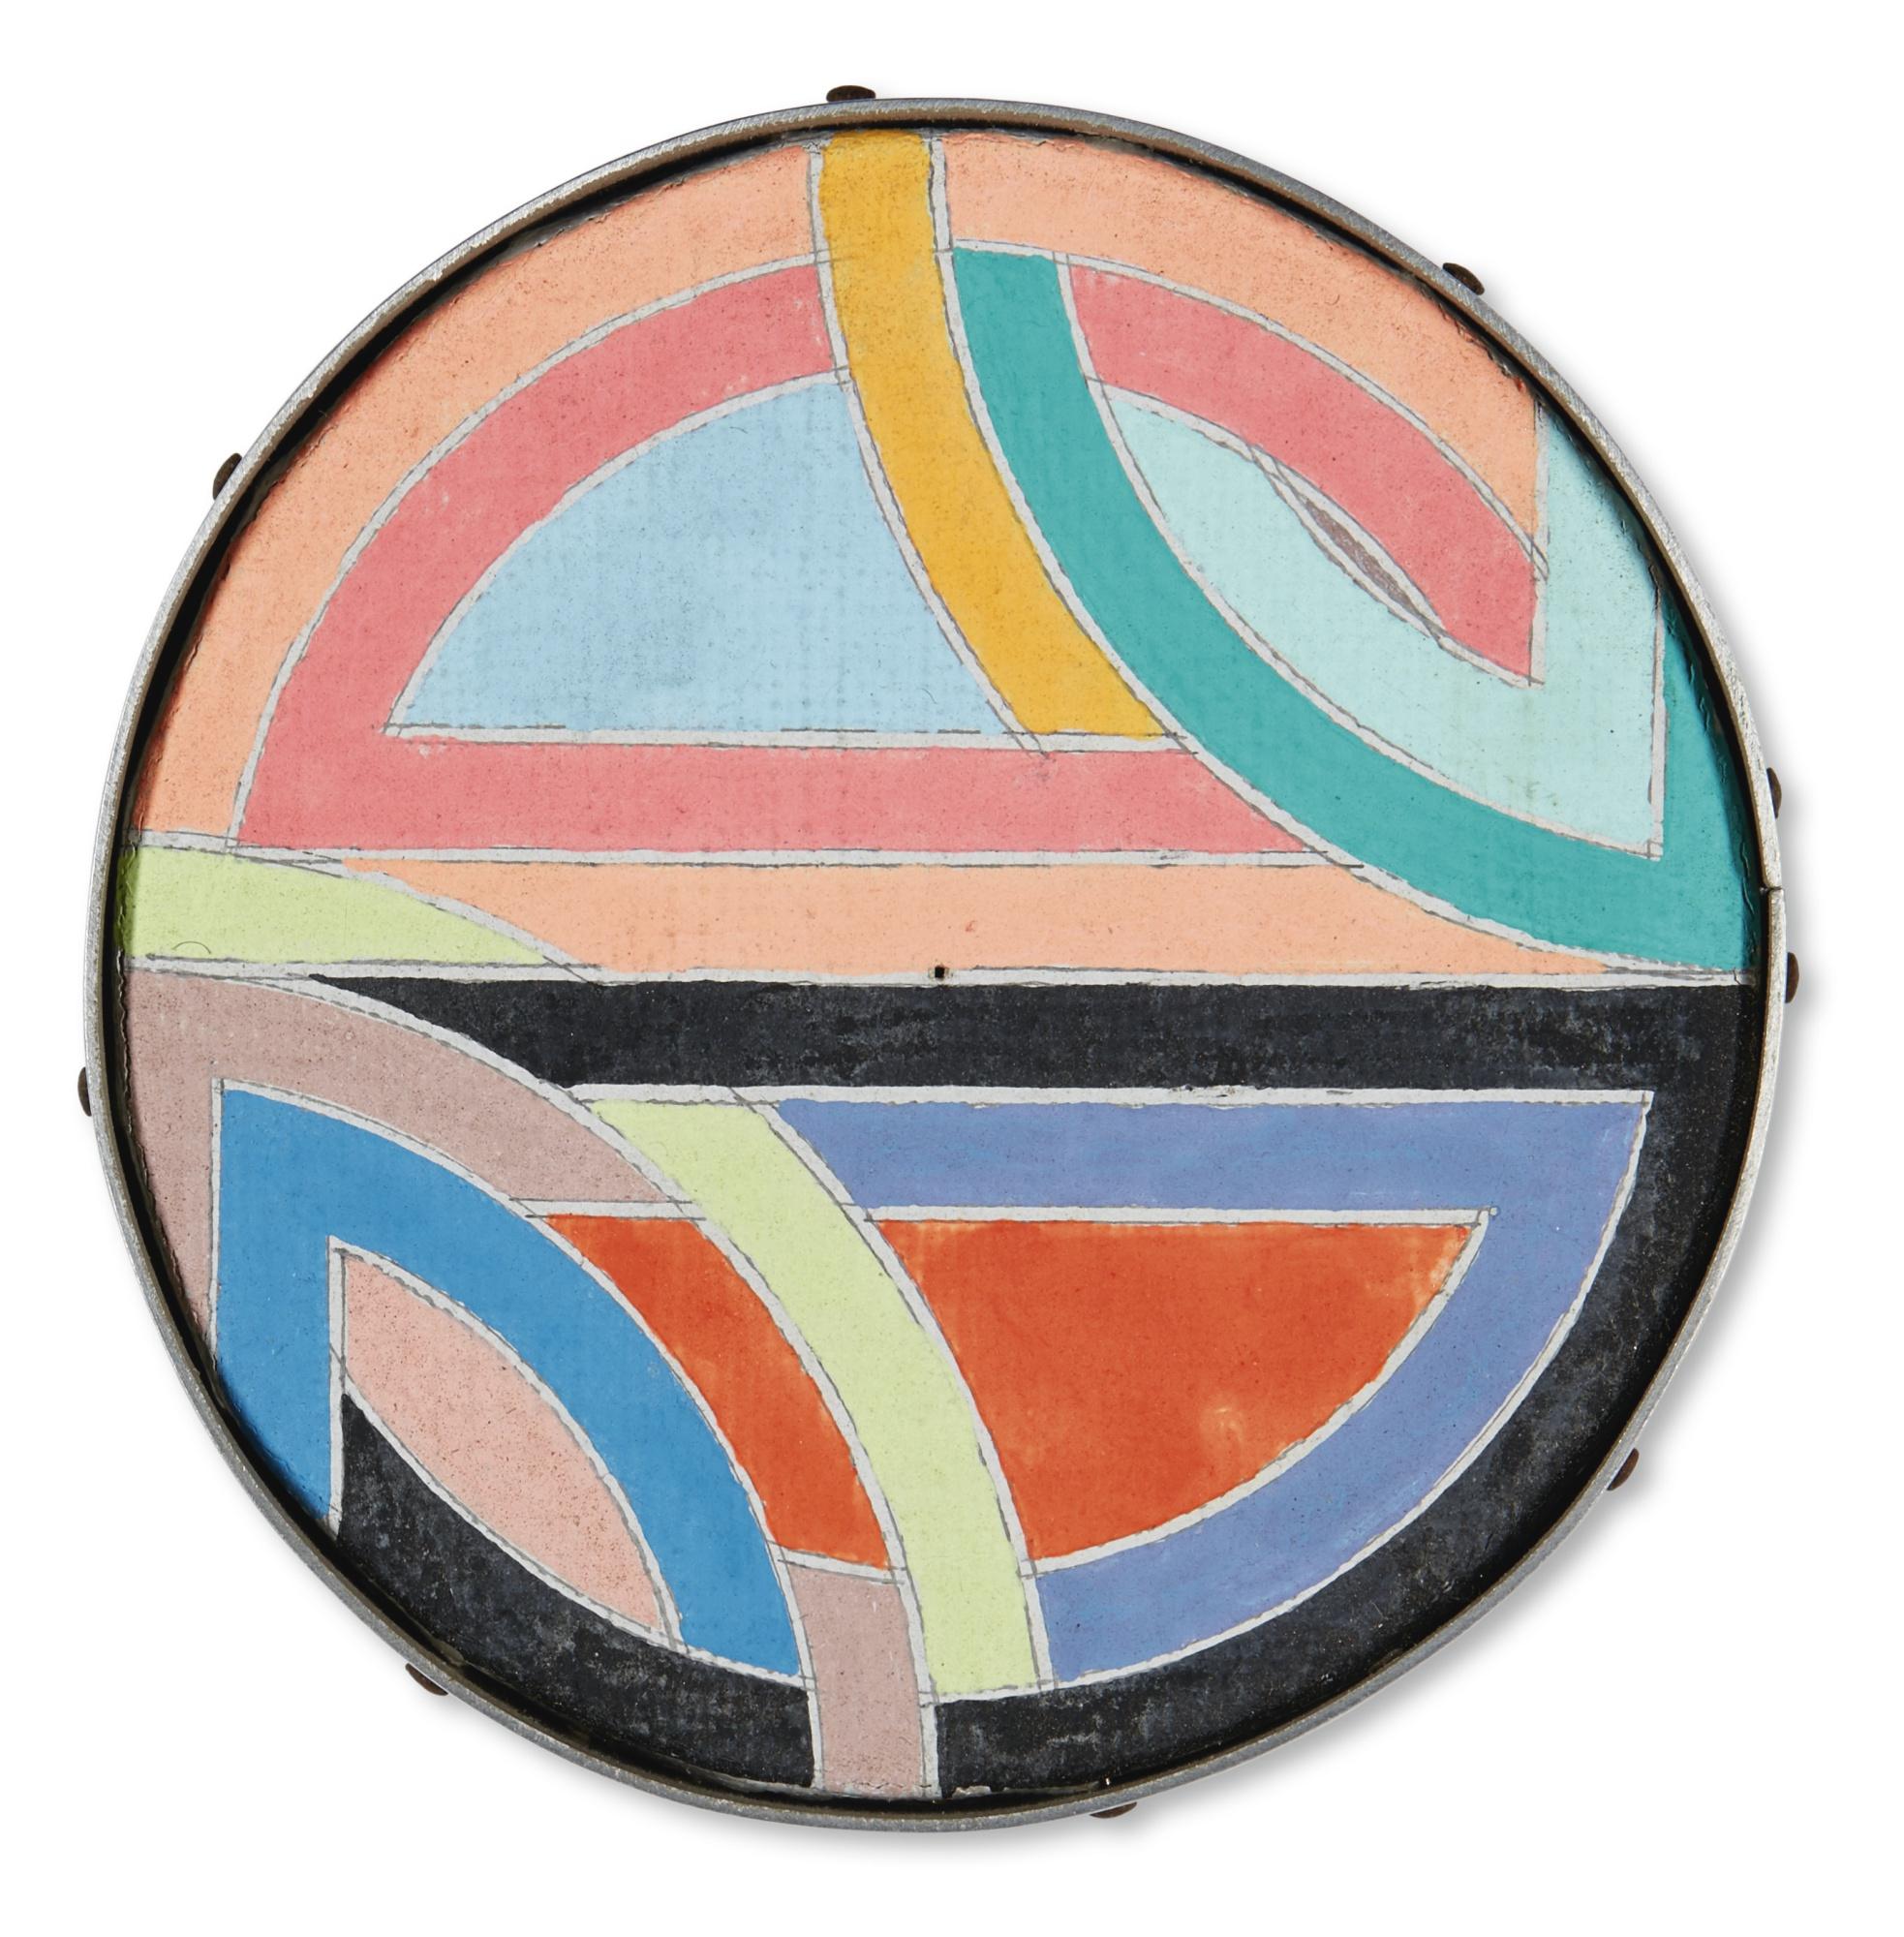 Richard Pettibone-Stella Sinjerli Variation II 1968-1969